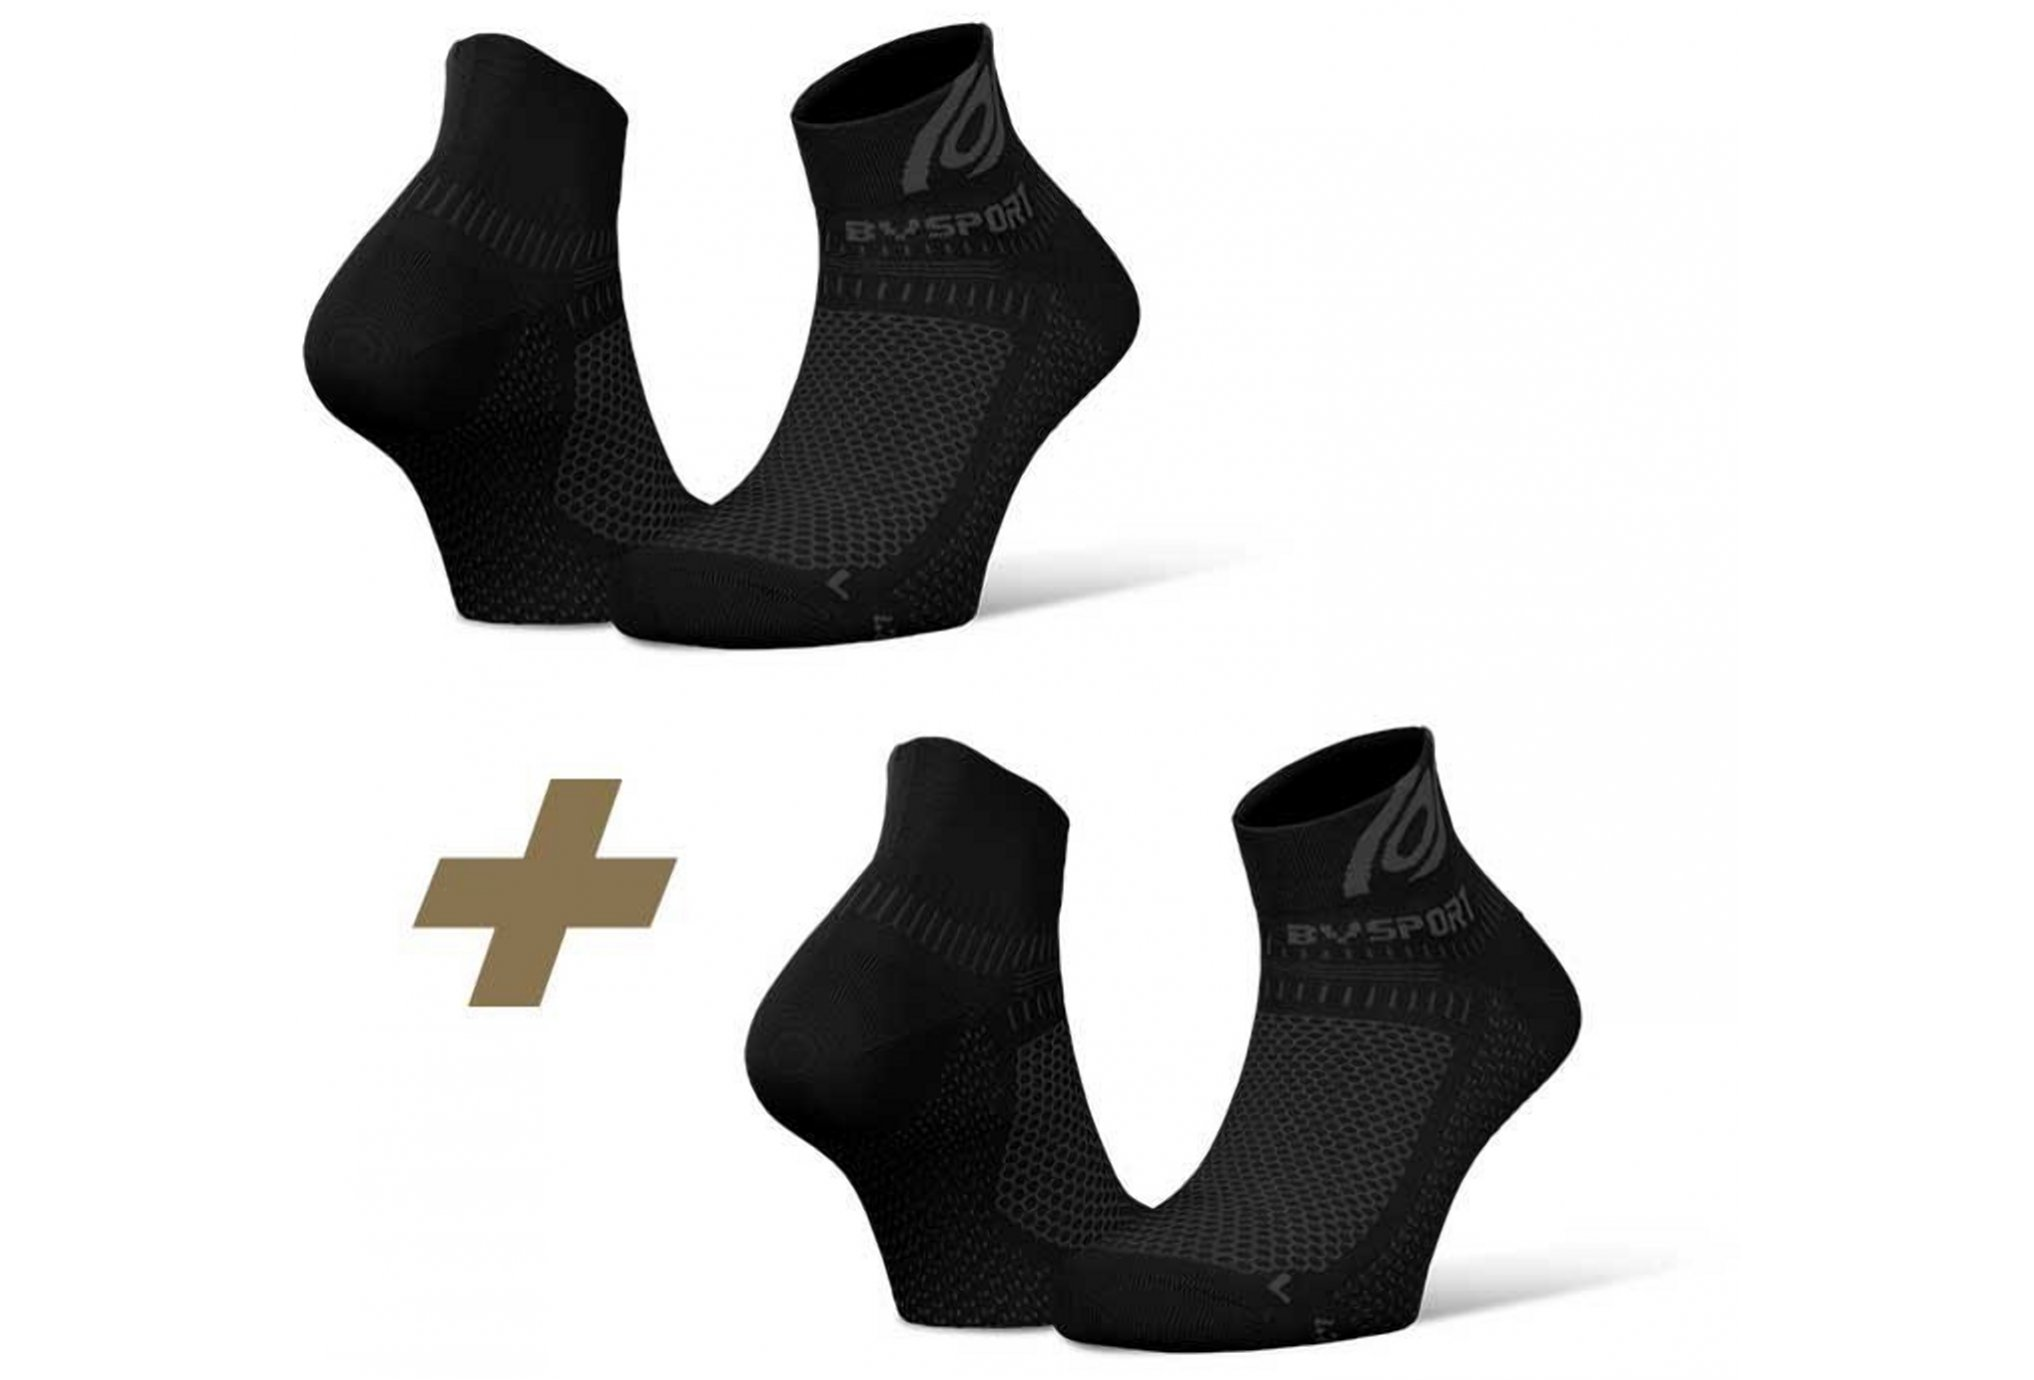 BV Sport Pack Light 3D Chaussettes